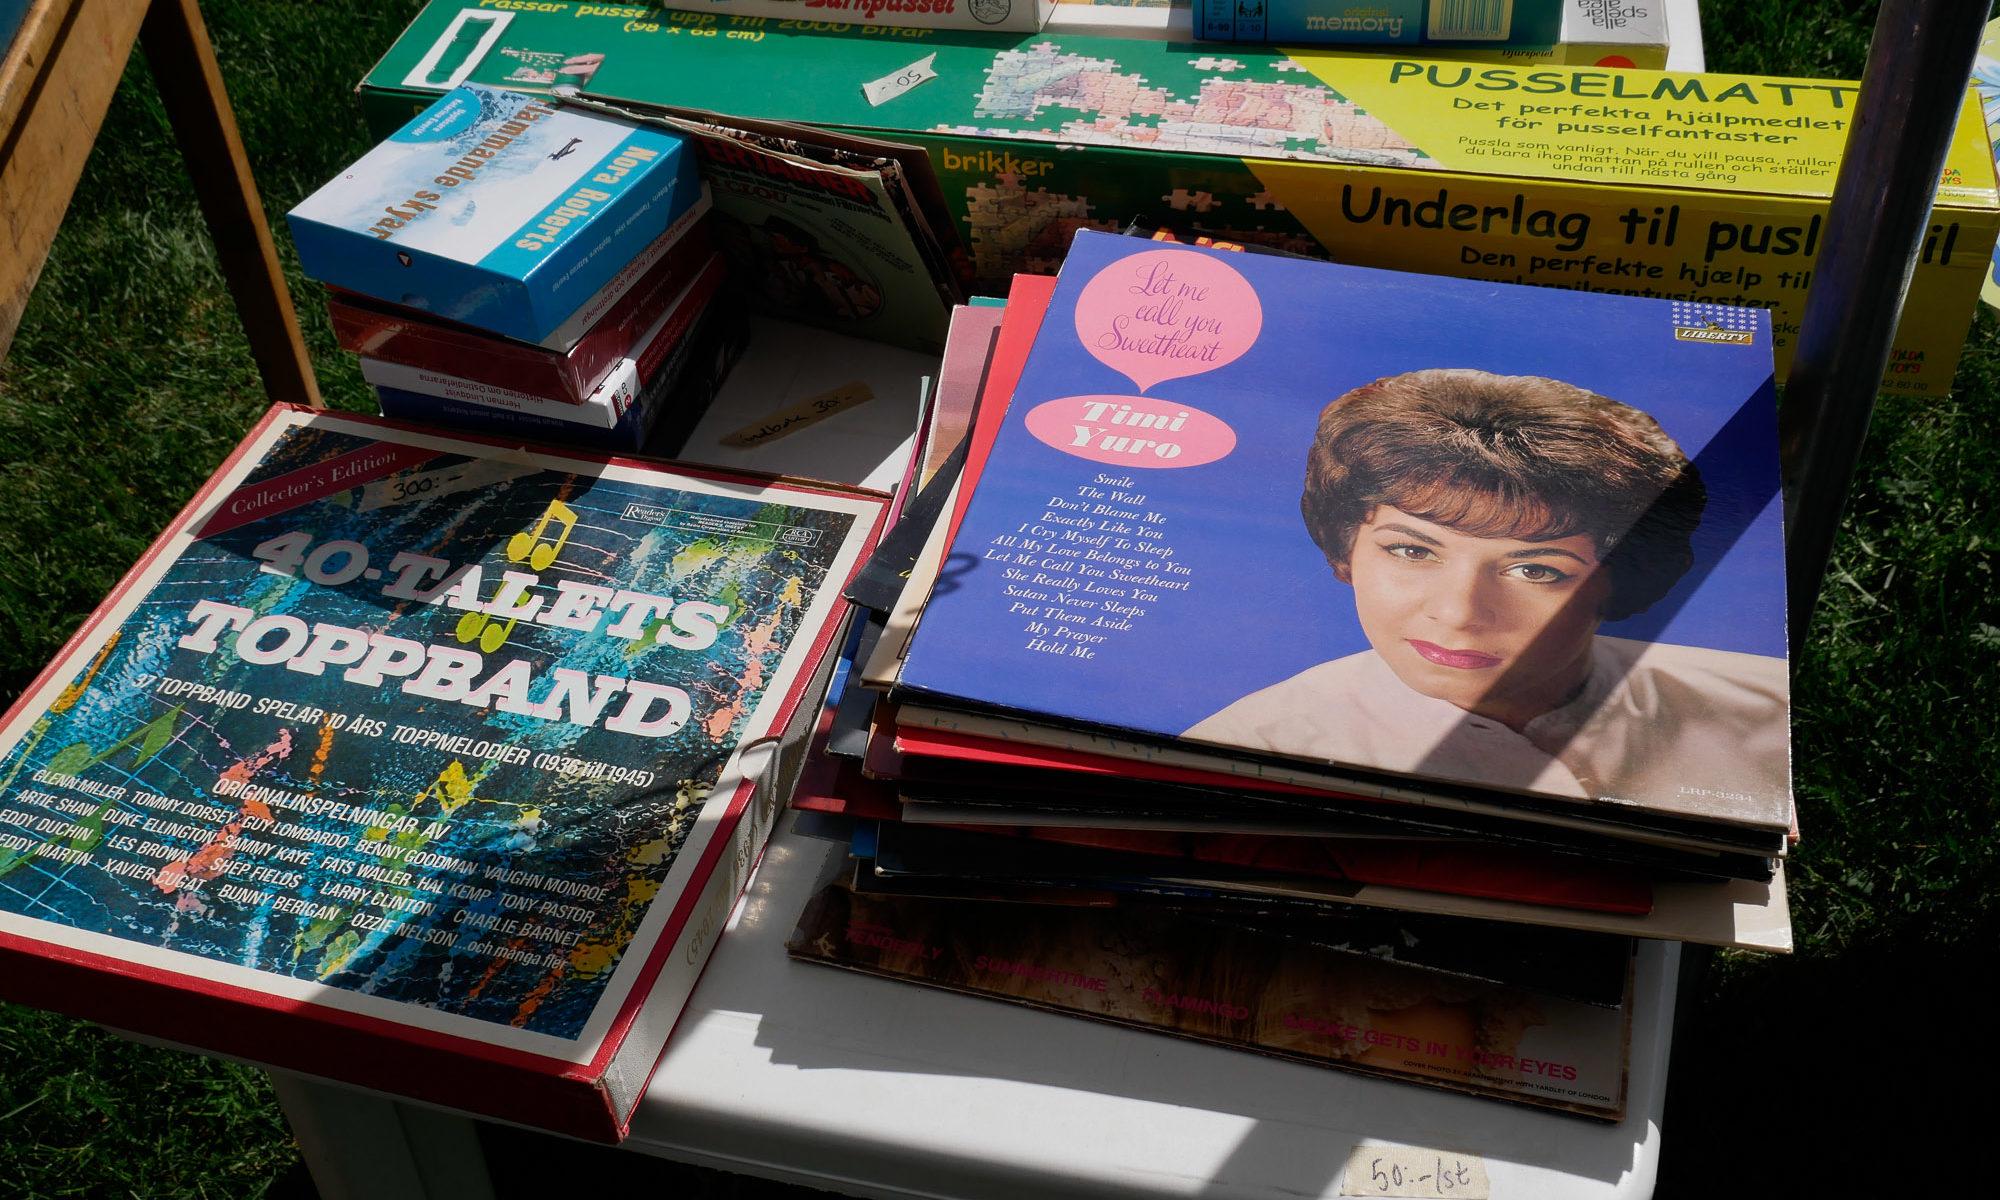 Loppisgrejer loppisrundan - skivomslag på loppisbord